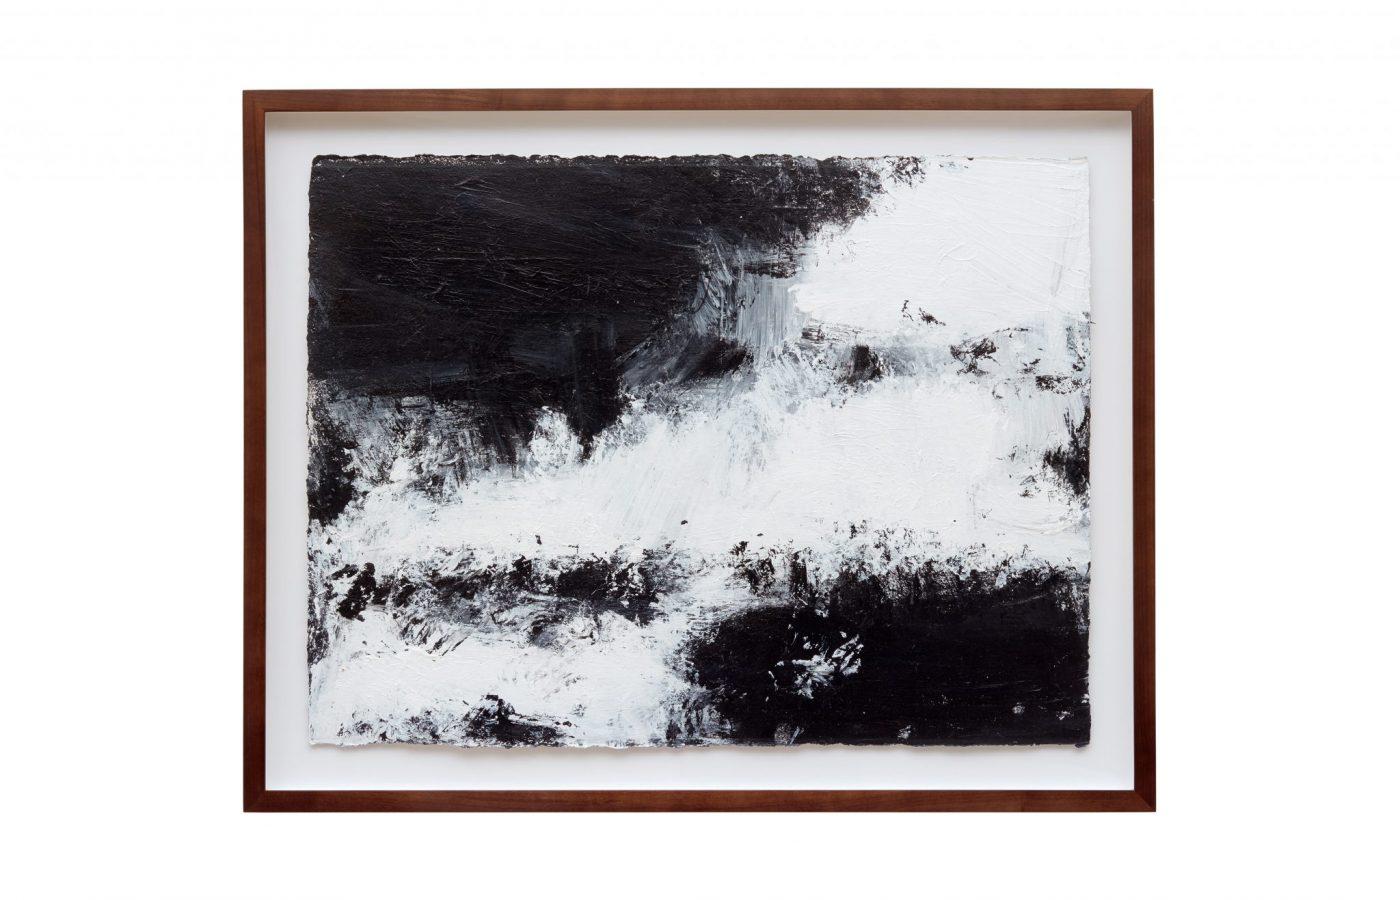 FXF18-27 John Virtue Untitled No 7 2014